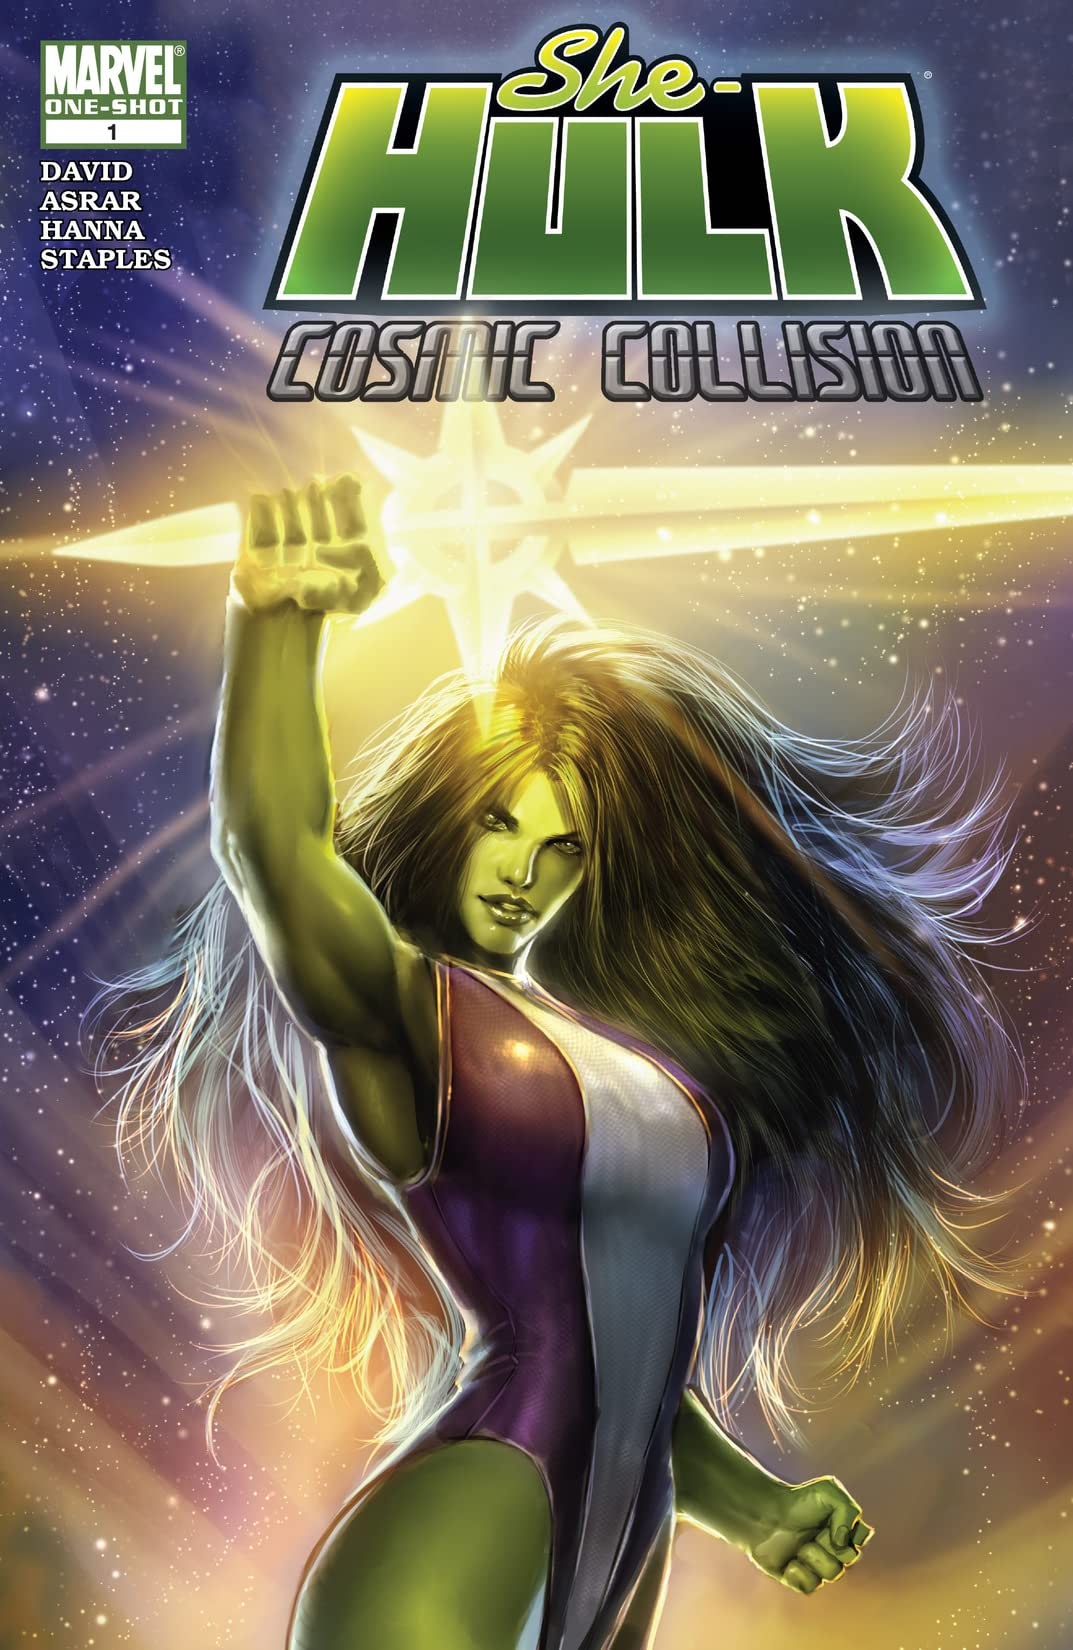 She-Hulk: Cosmic Collision (2008) #1